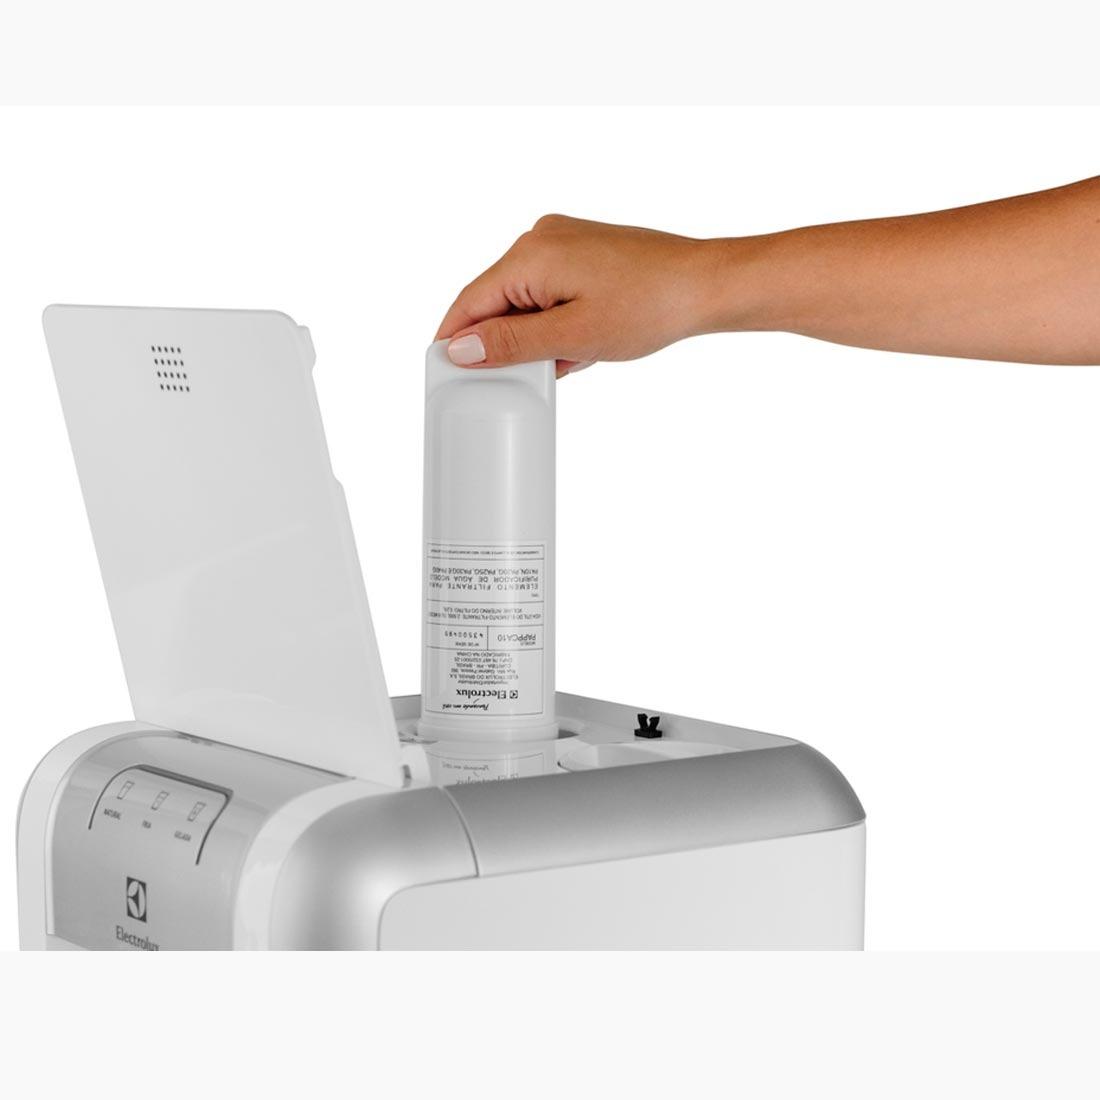 Filtro Refil Para Purificador de Água Electrolux PAPPCA10 Original